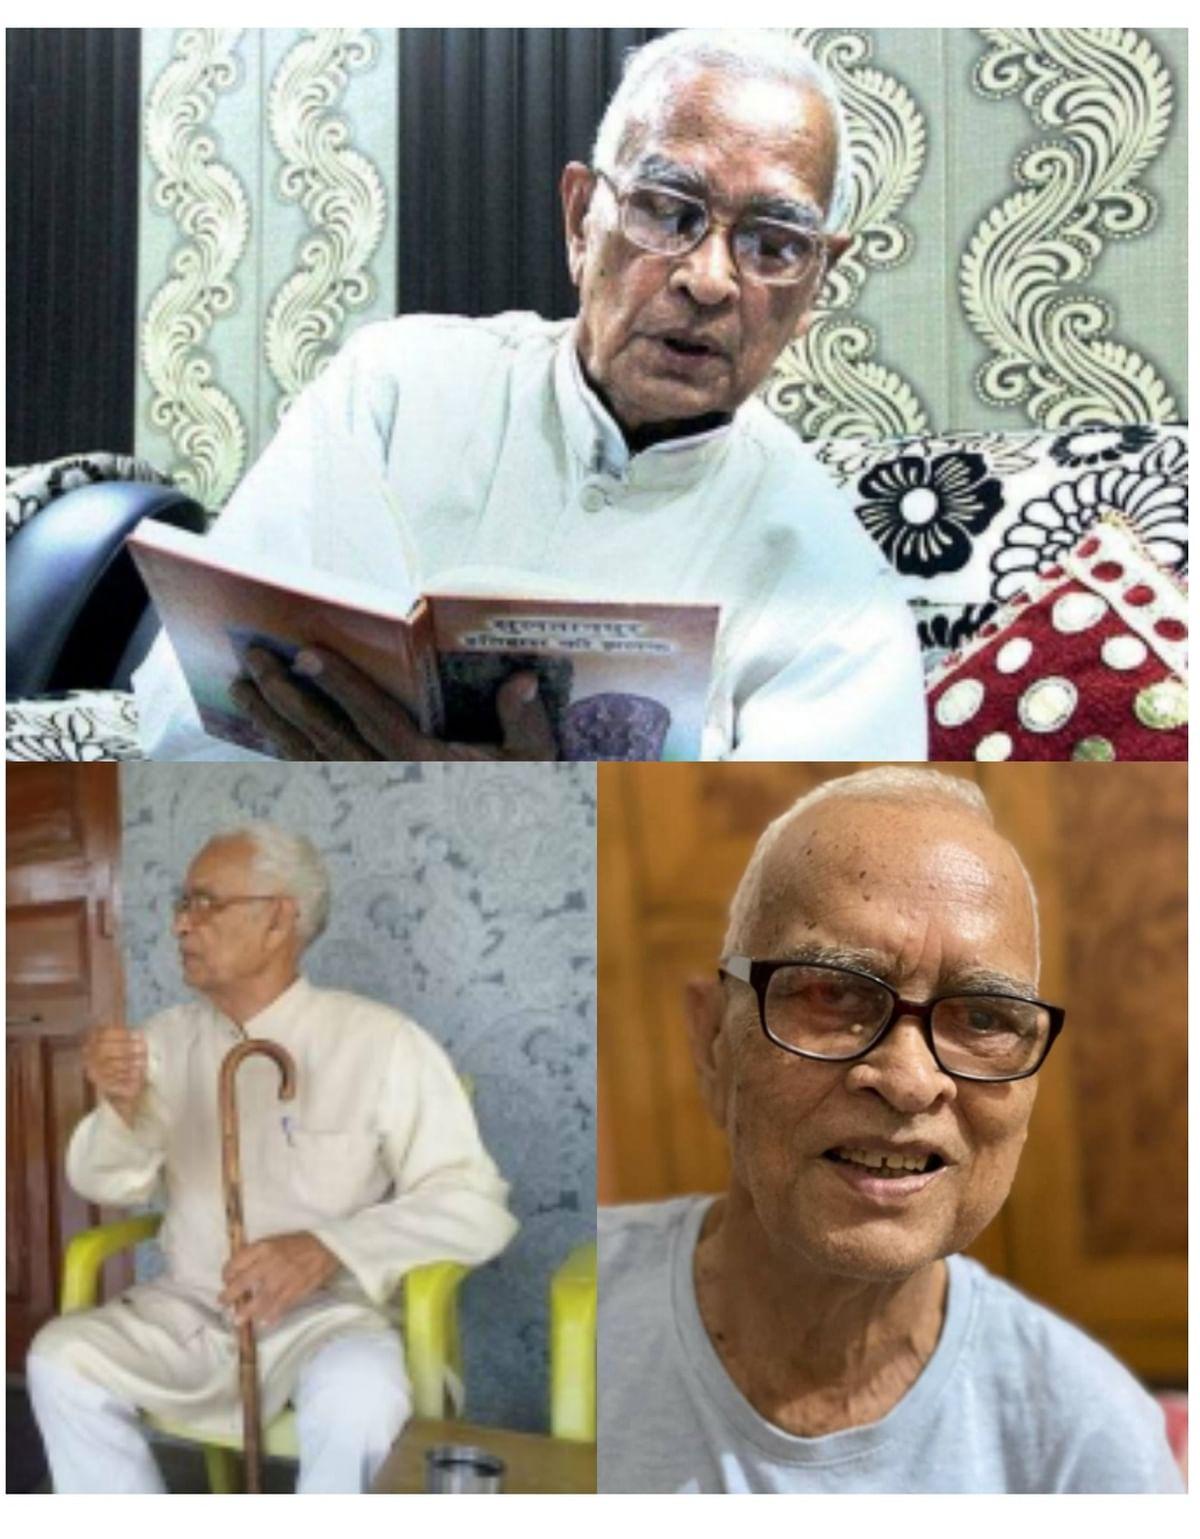 पत्रकार ,अधिवक्ता और इतिहासकार राजेश्वर सिंह का निधन, शोक